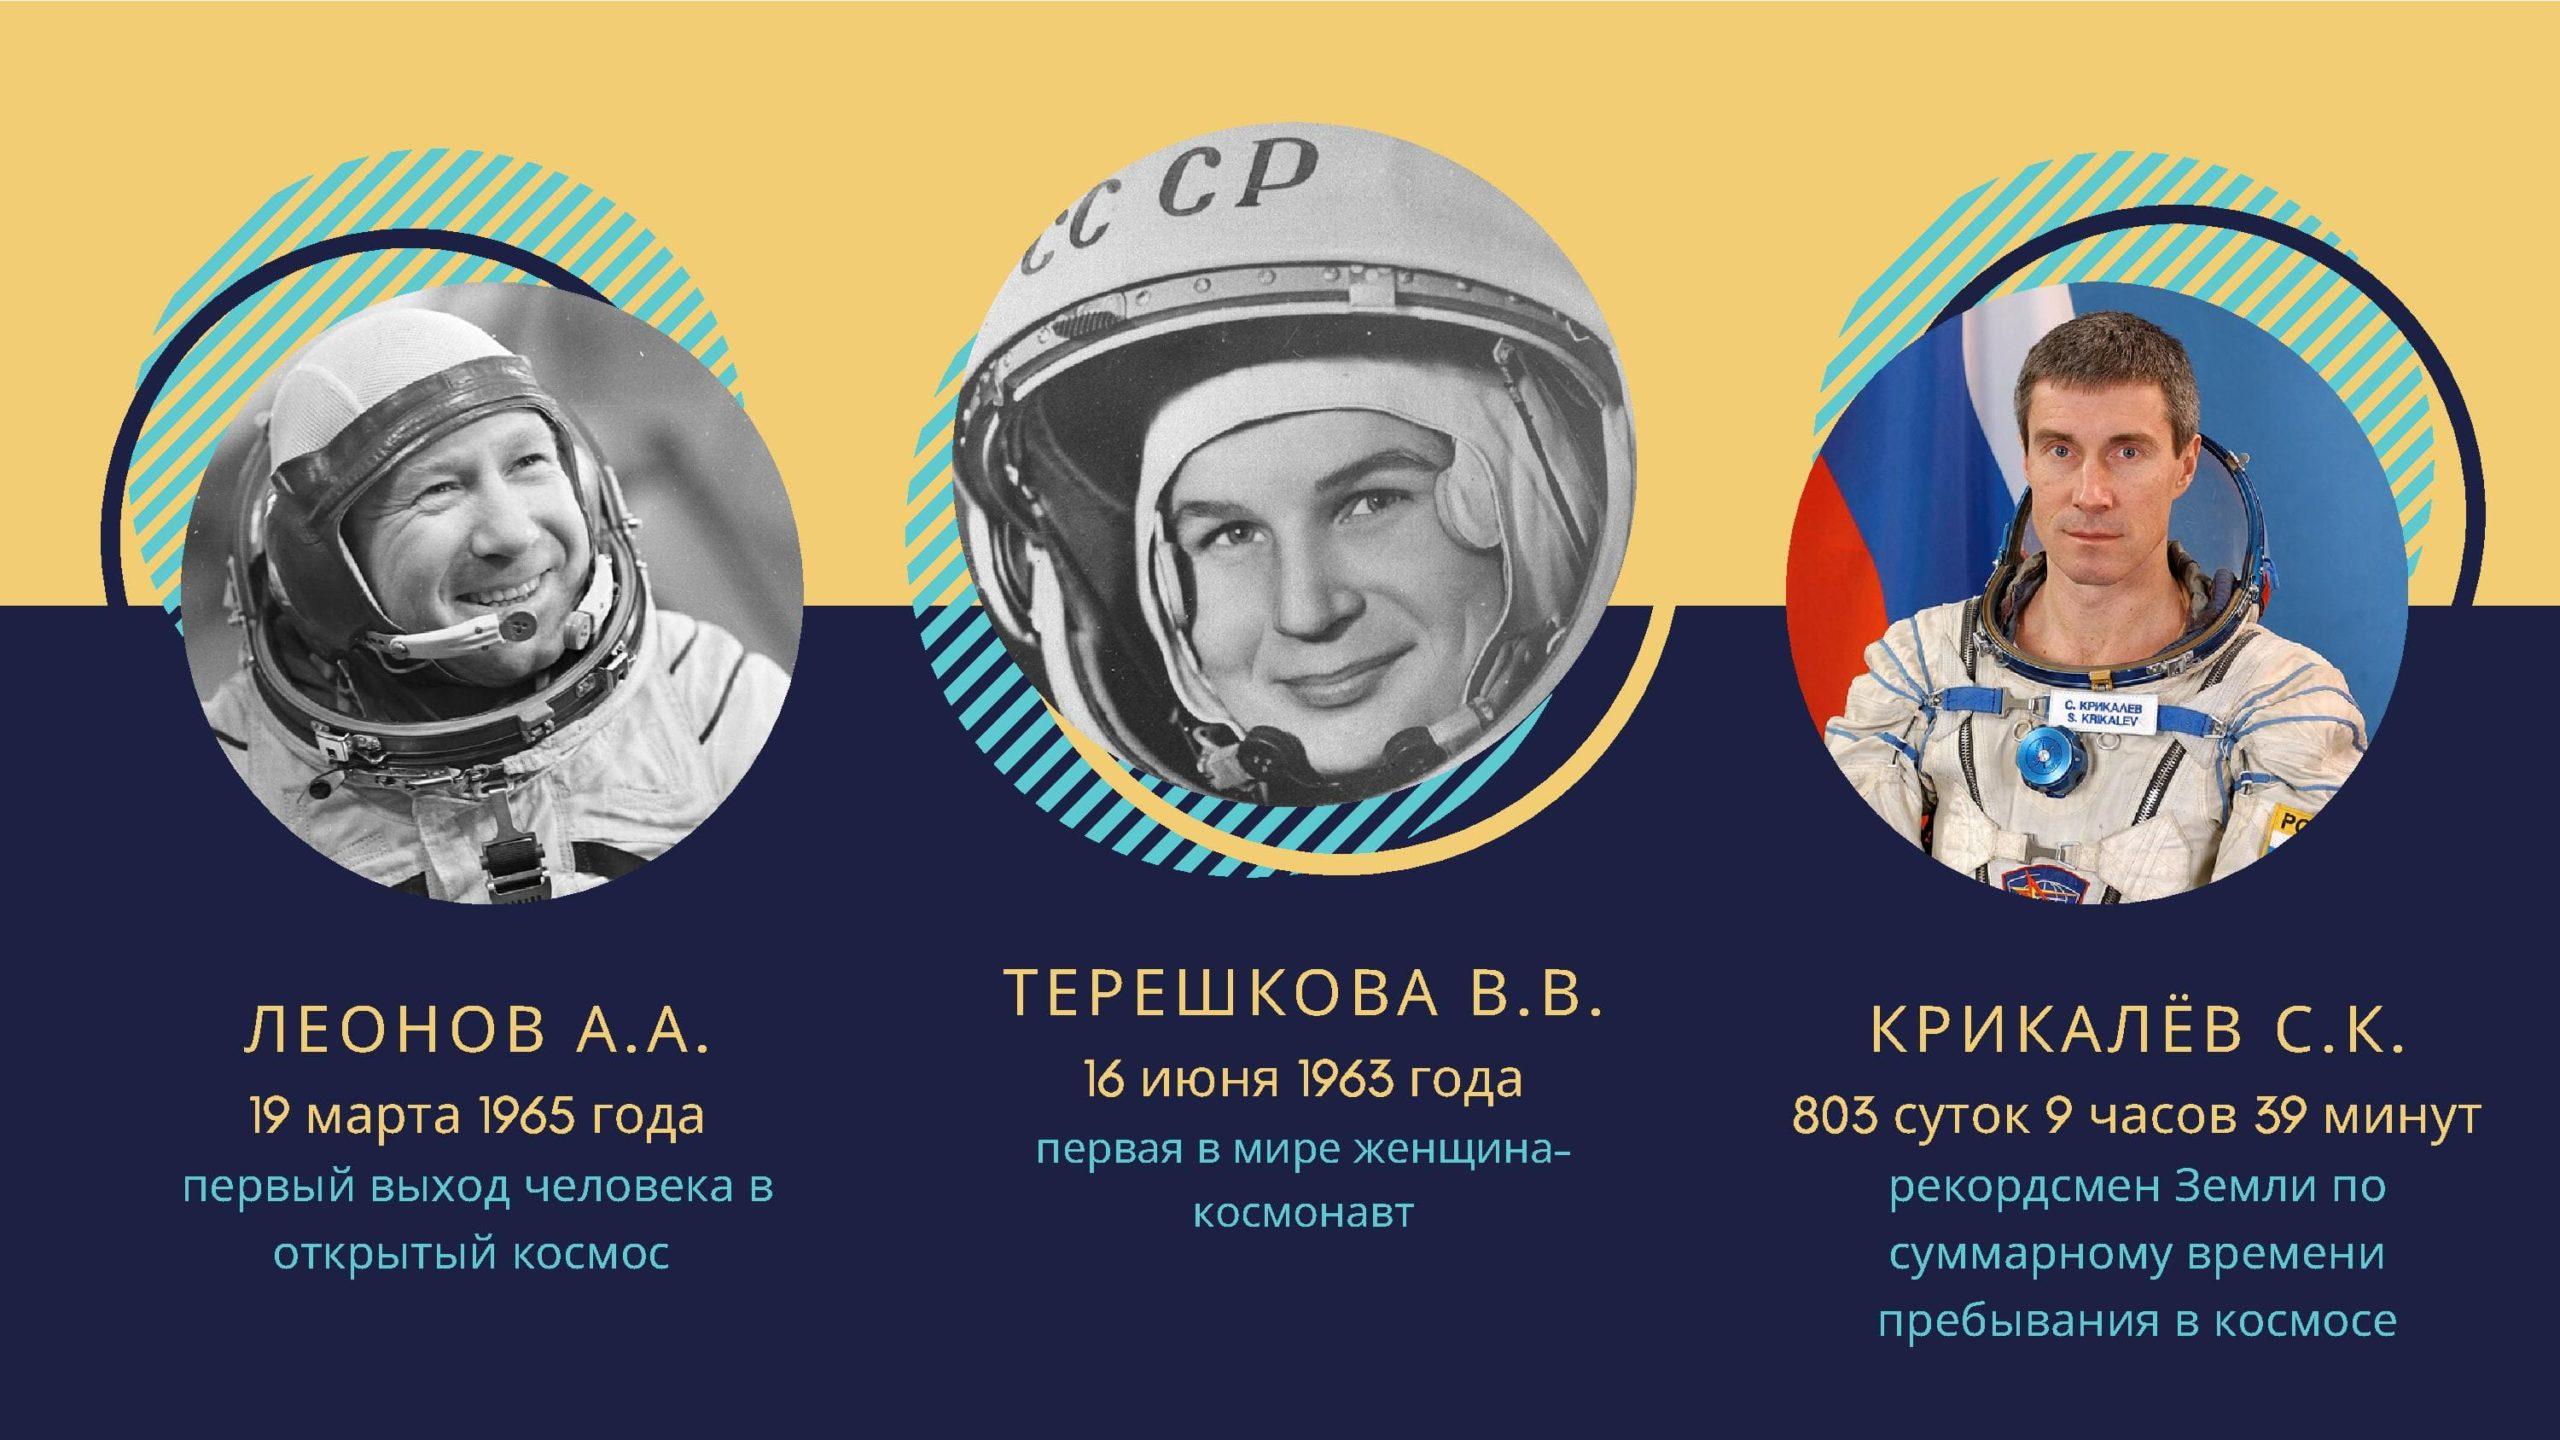 Леонов А.А., Терешкова В.В., Крикалев С.К.